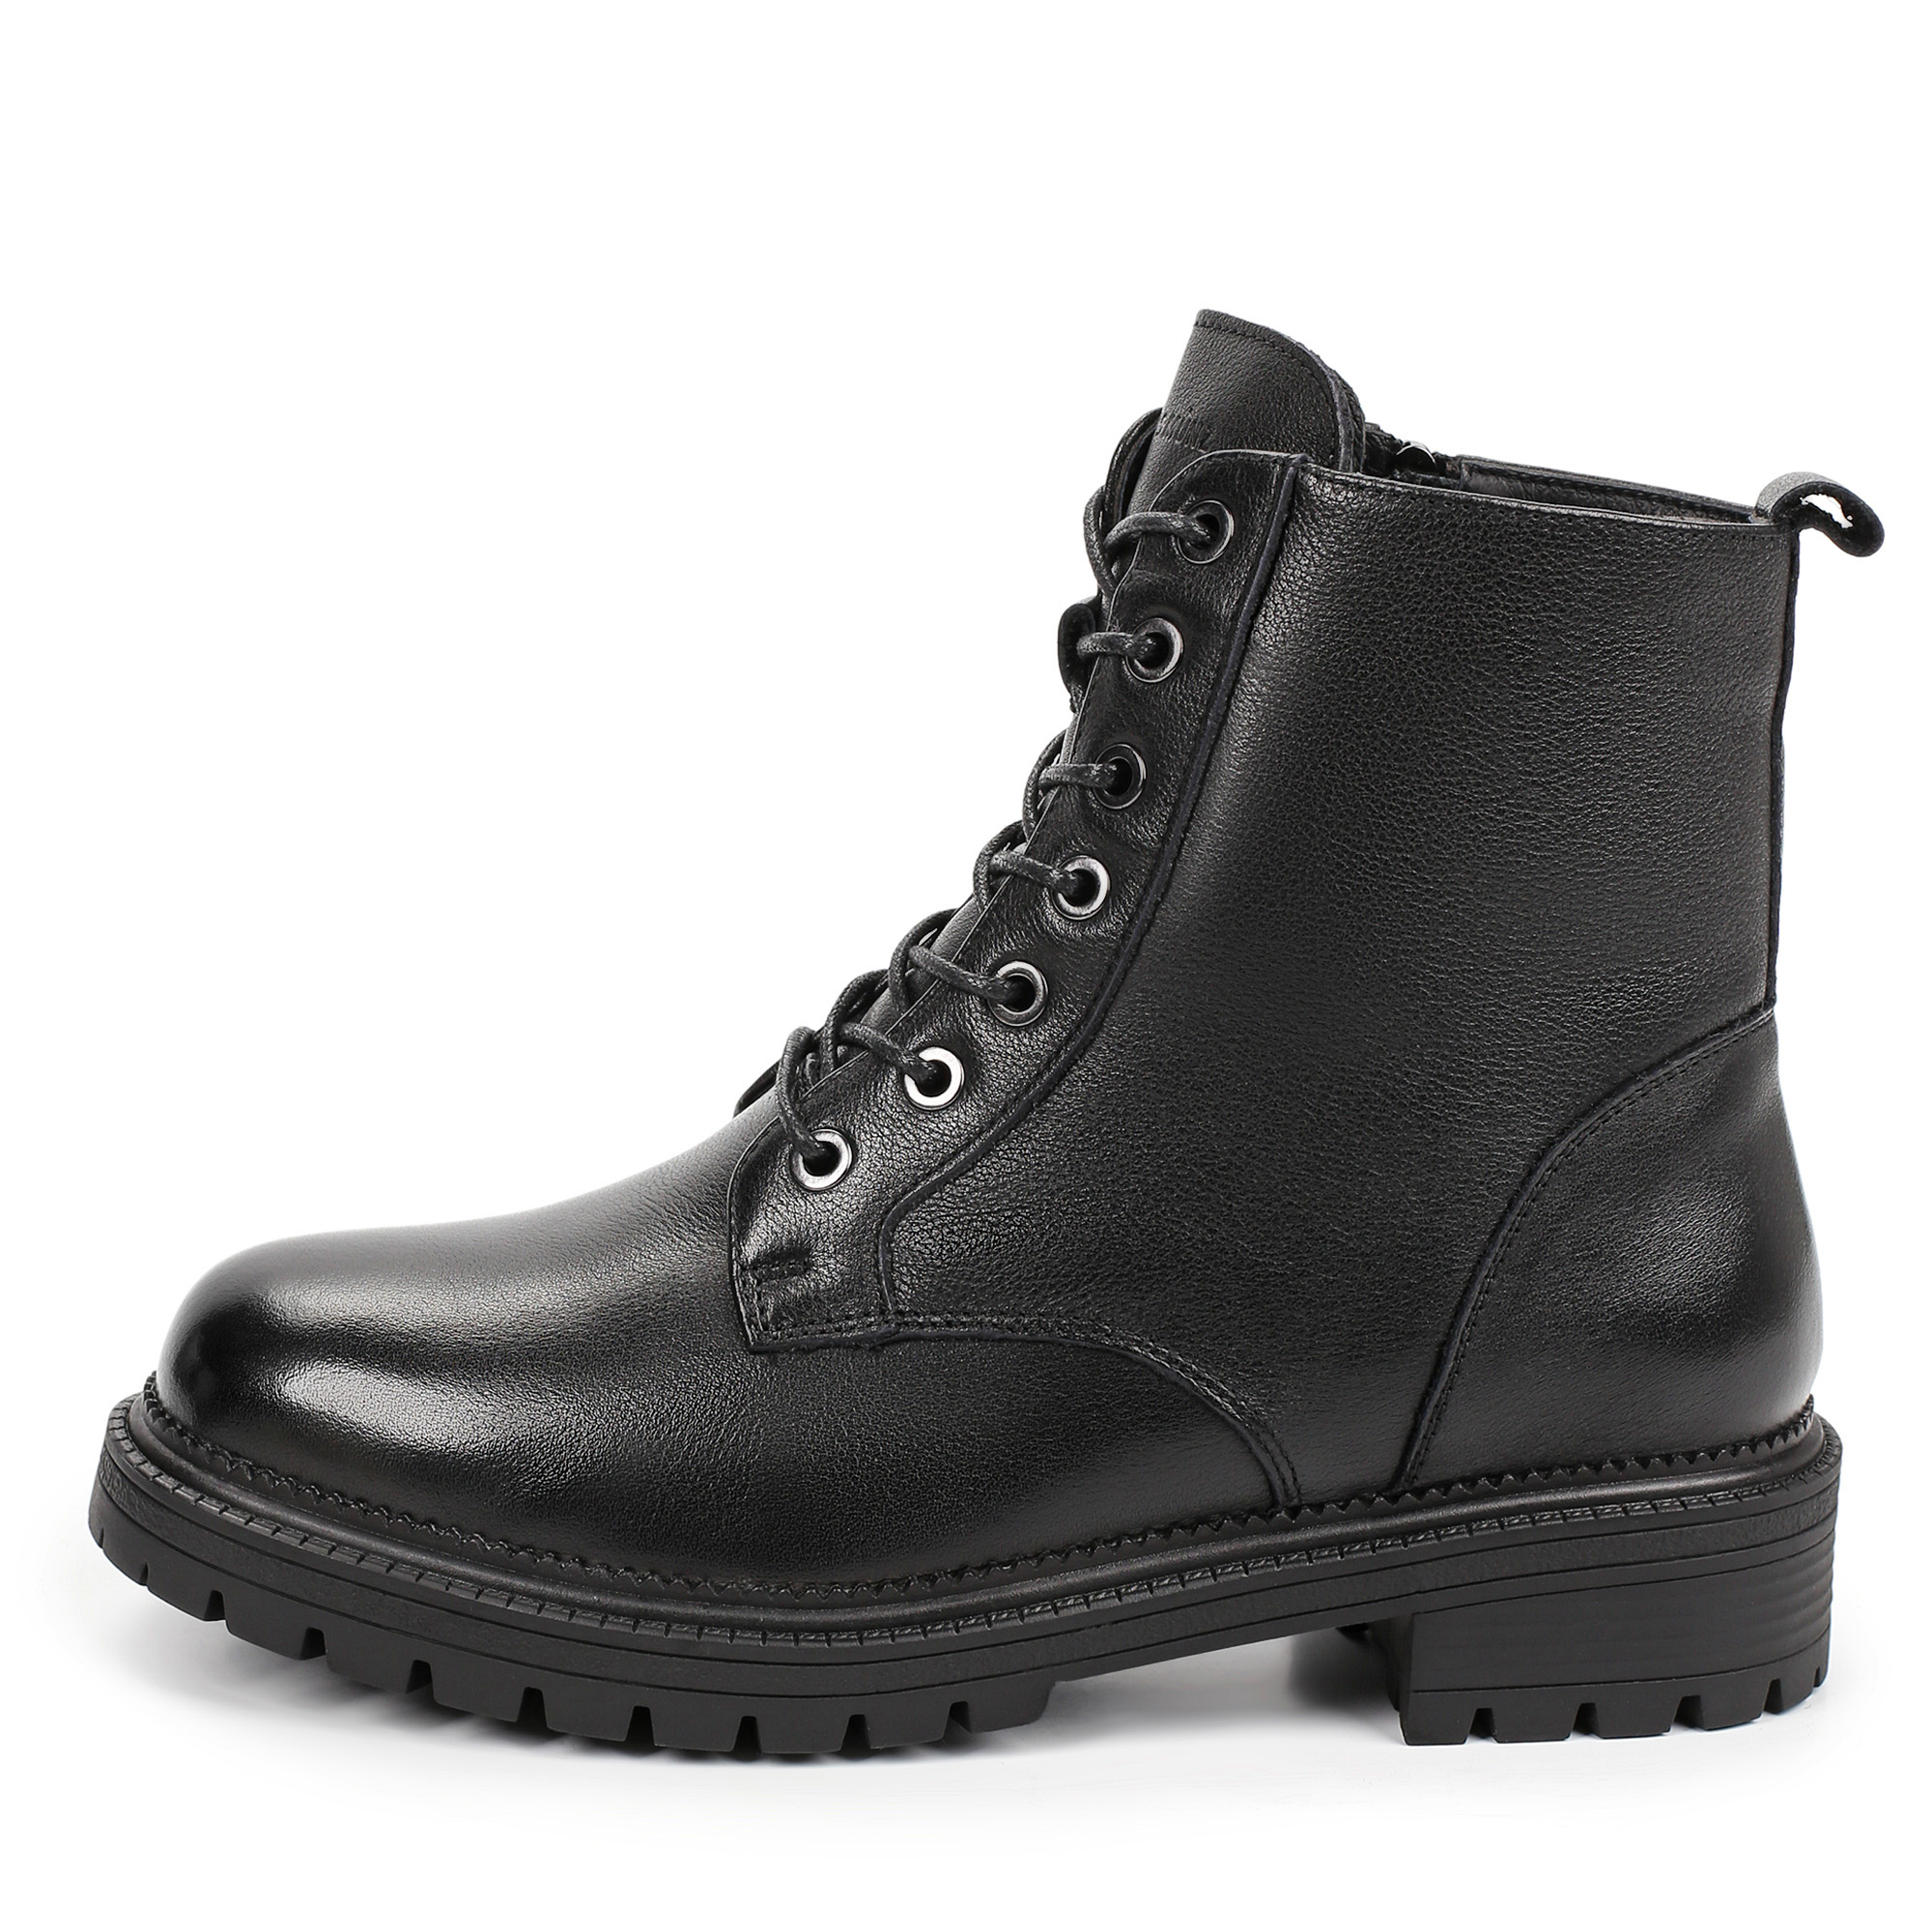 Ботинки Thomas Munz 058-515A-31020